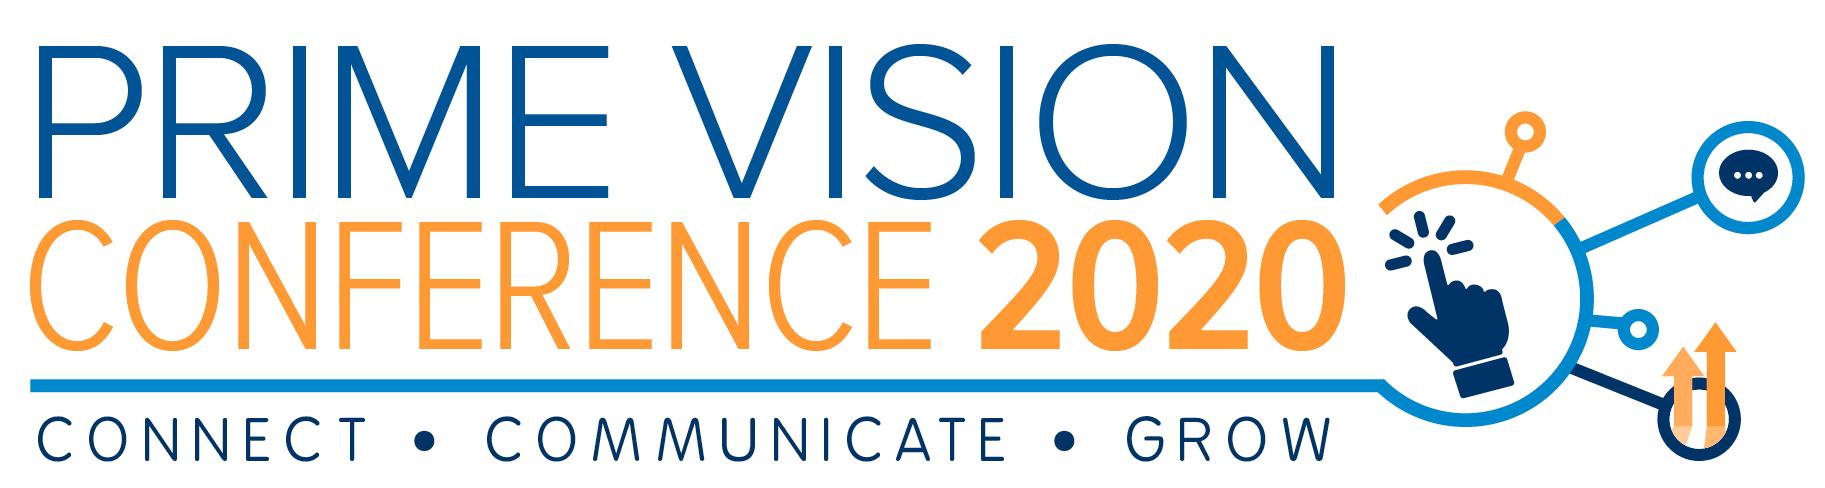 Prime Conference Vision 2020 logo